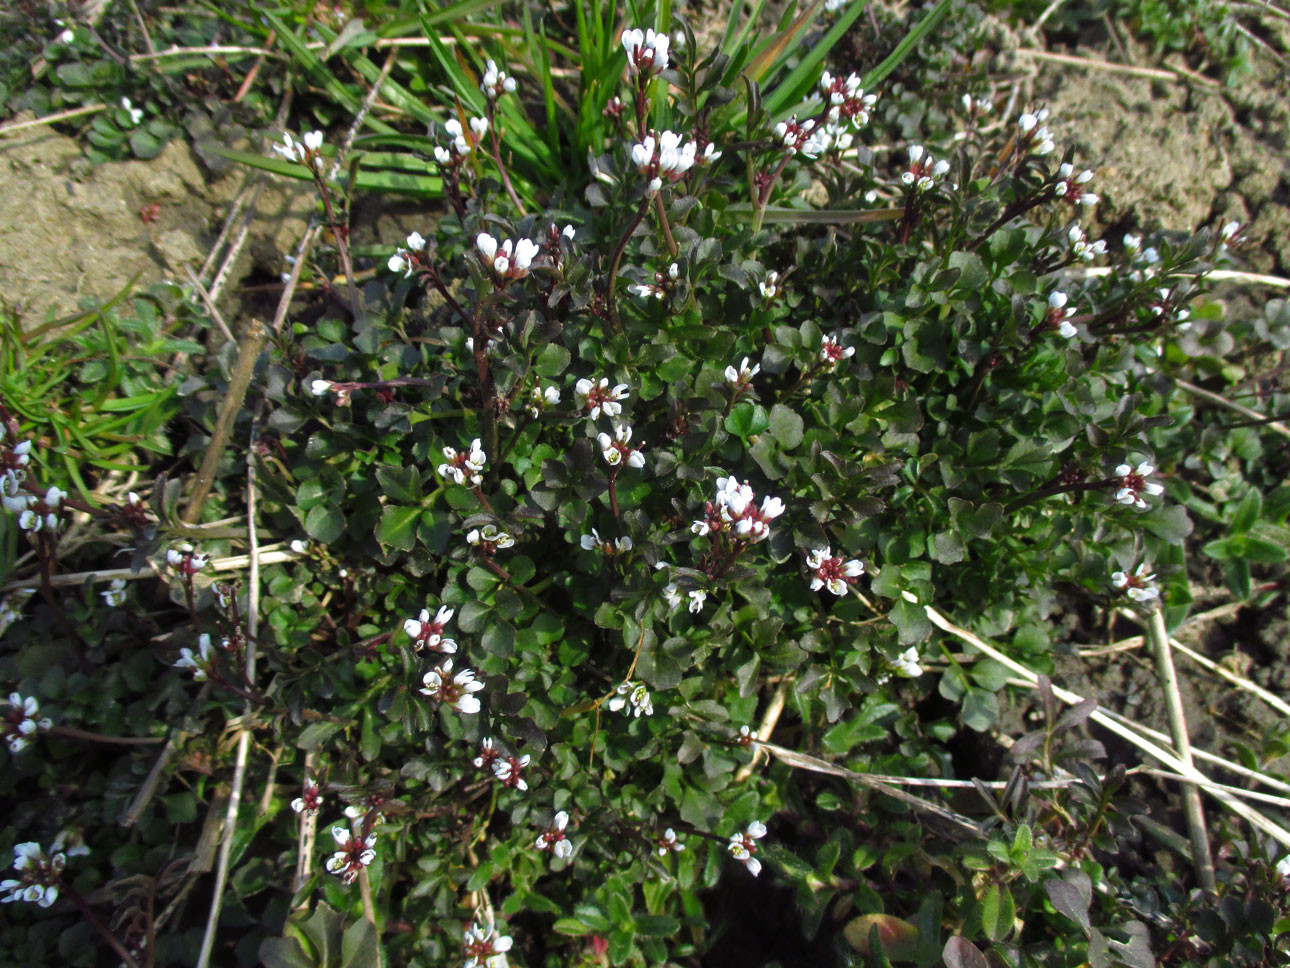 Ruderal-Schaumkraut (Cardamine hirsuta) | Familie: Kreuzblütler (Brassicaceae)